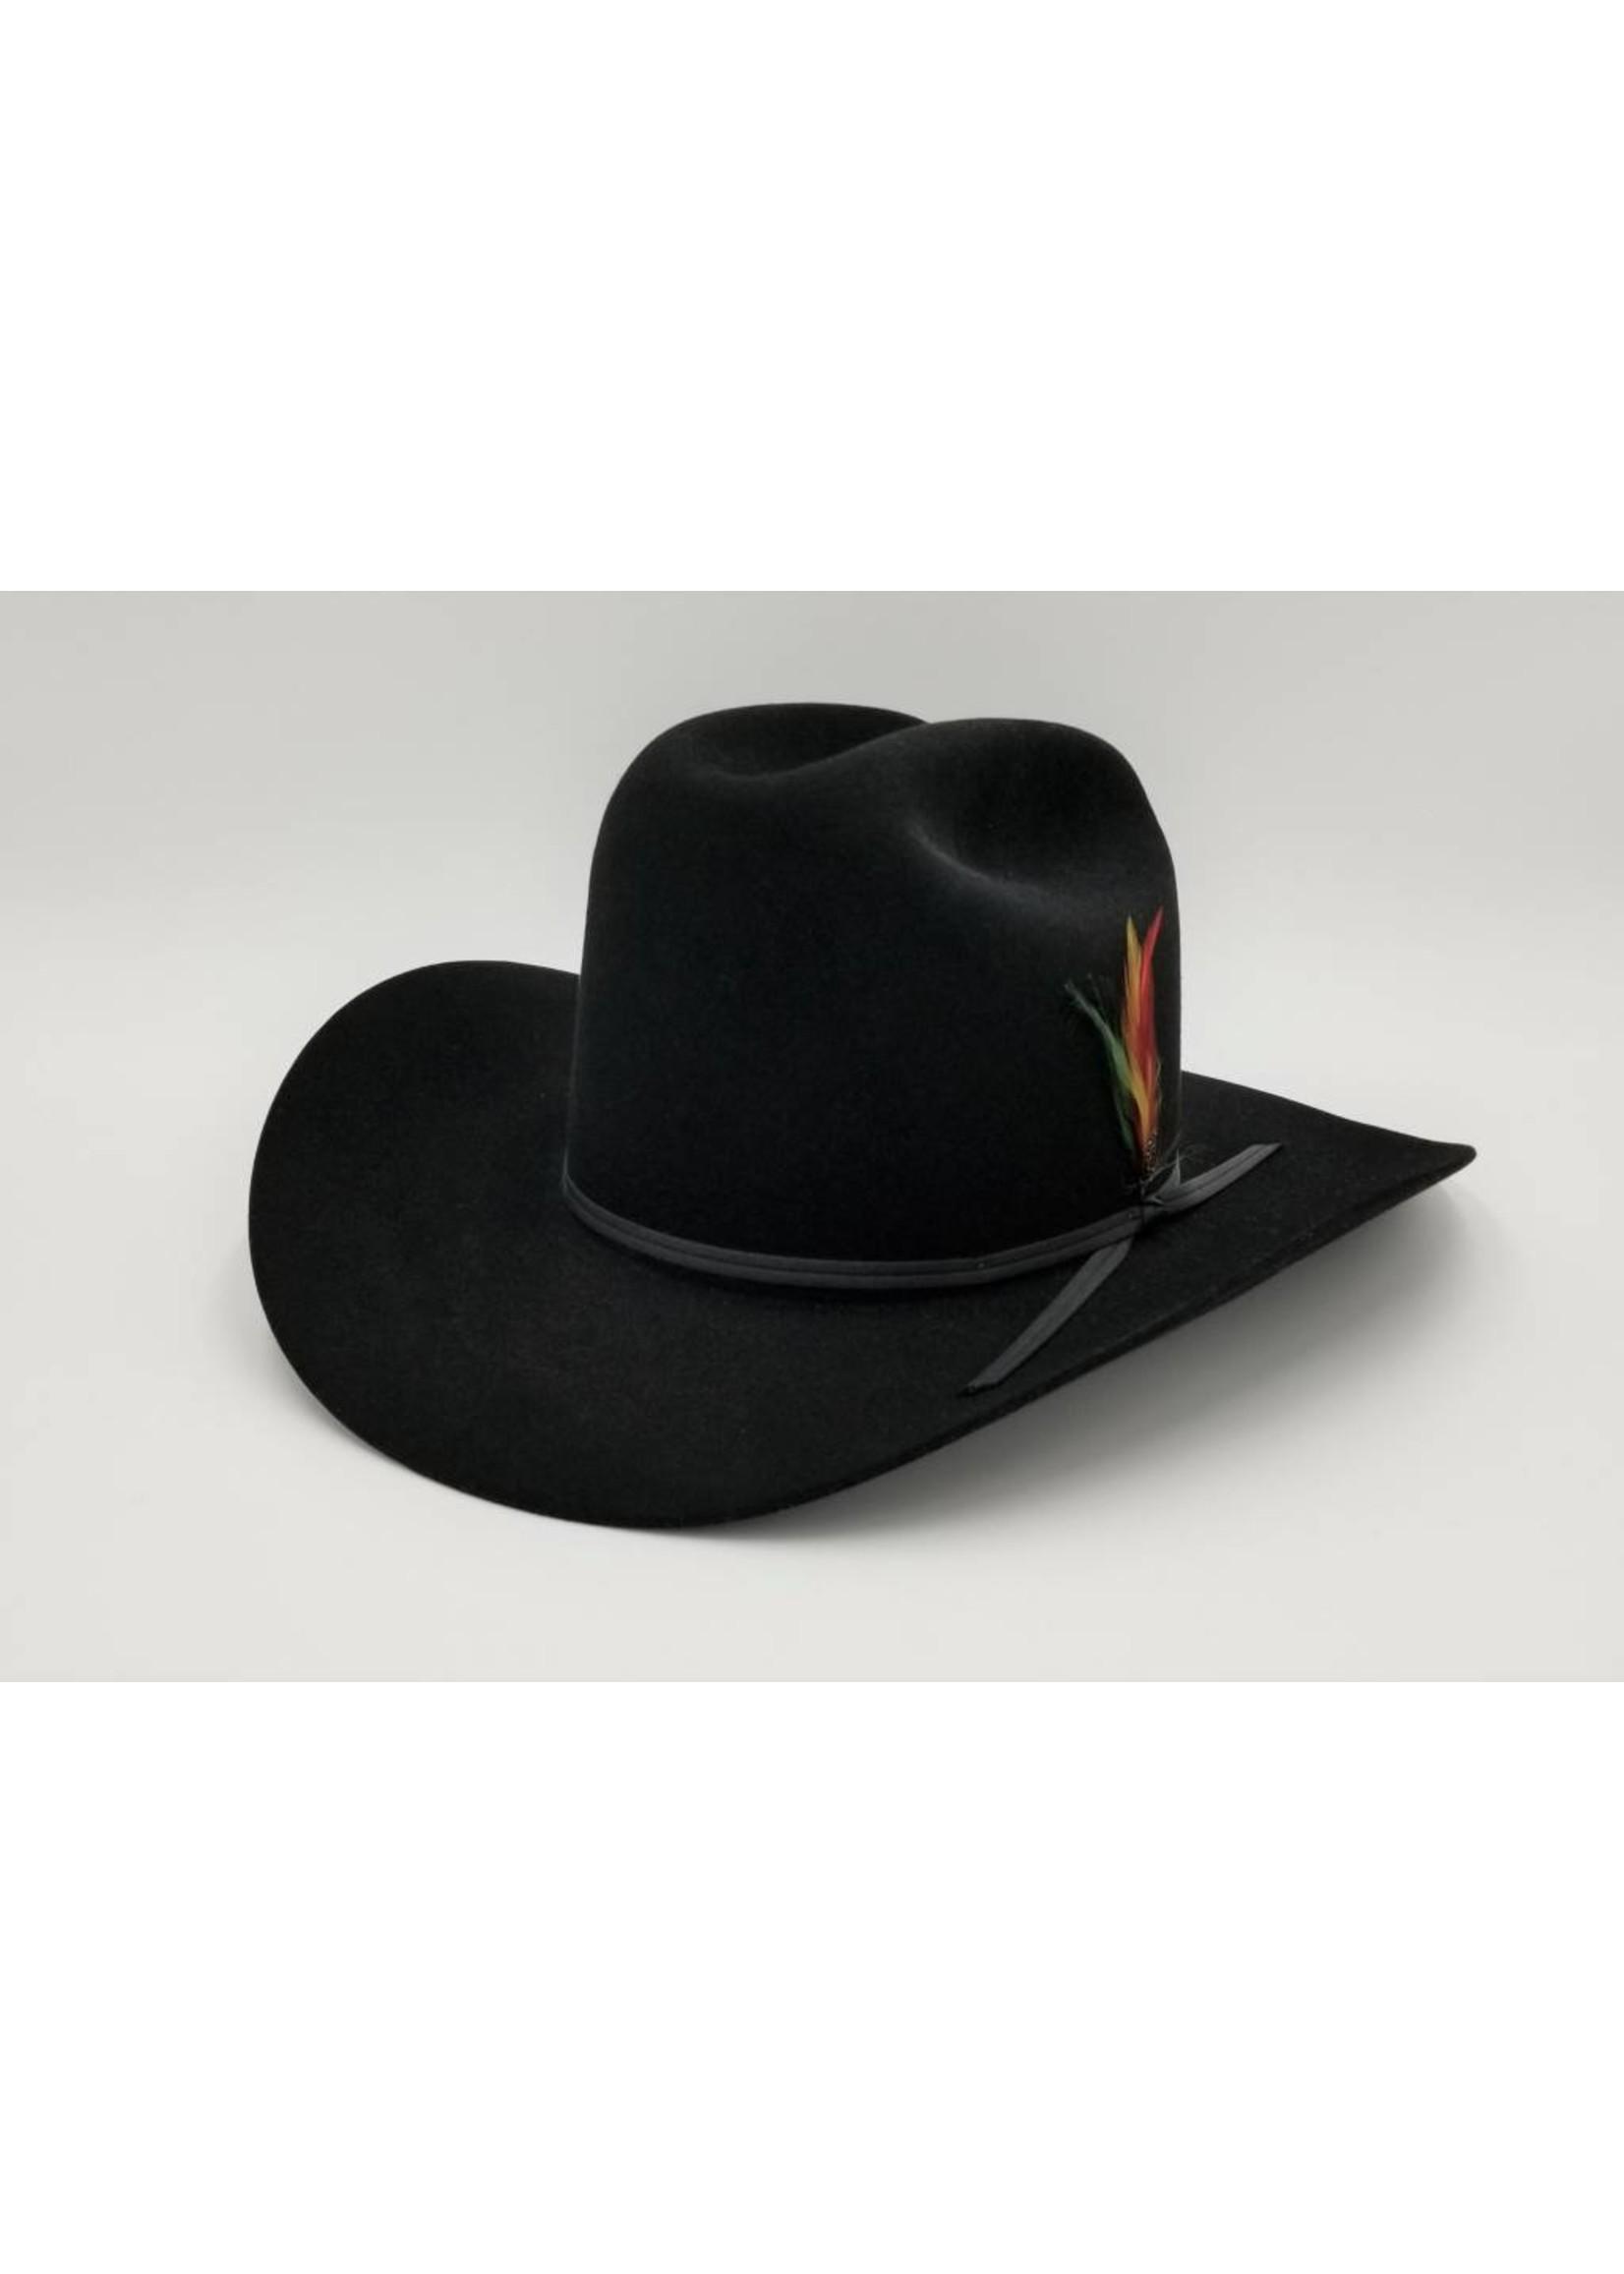 Stetson Rancher Black / 3 1/2 Brim